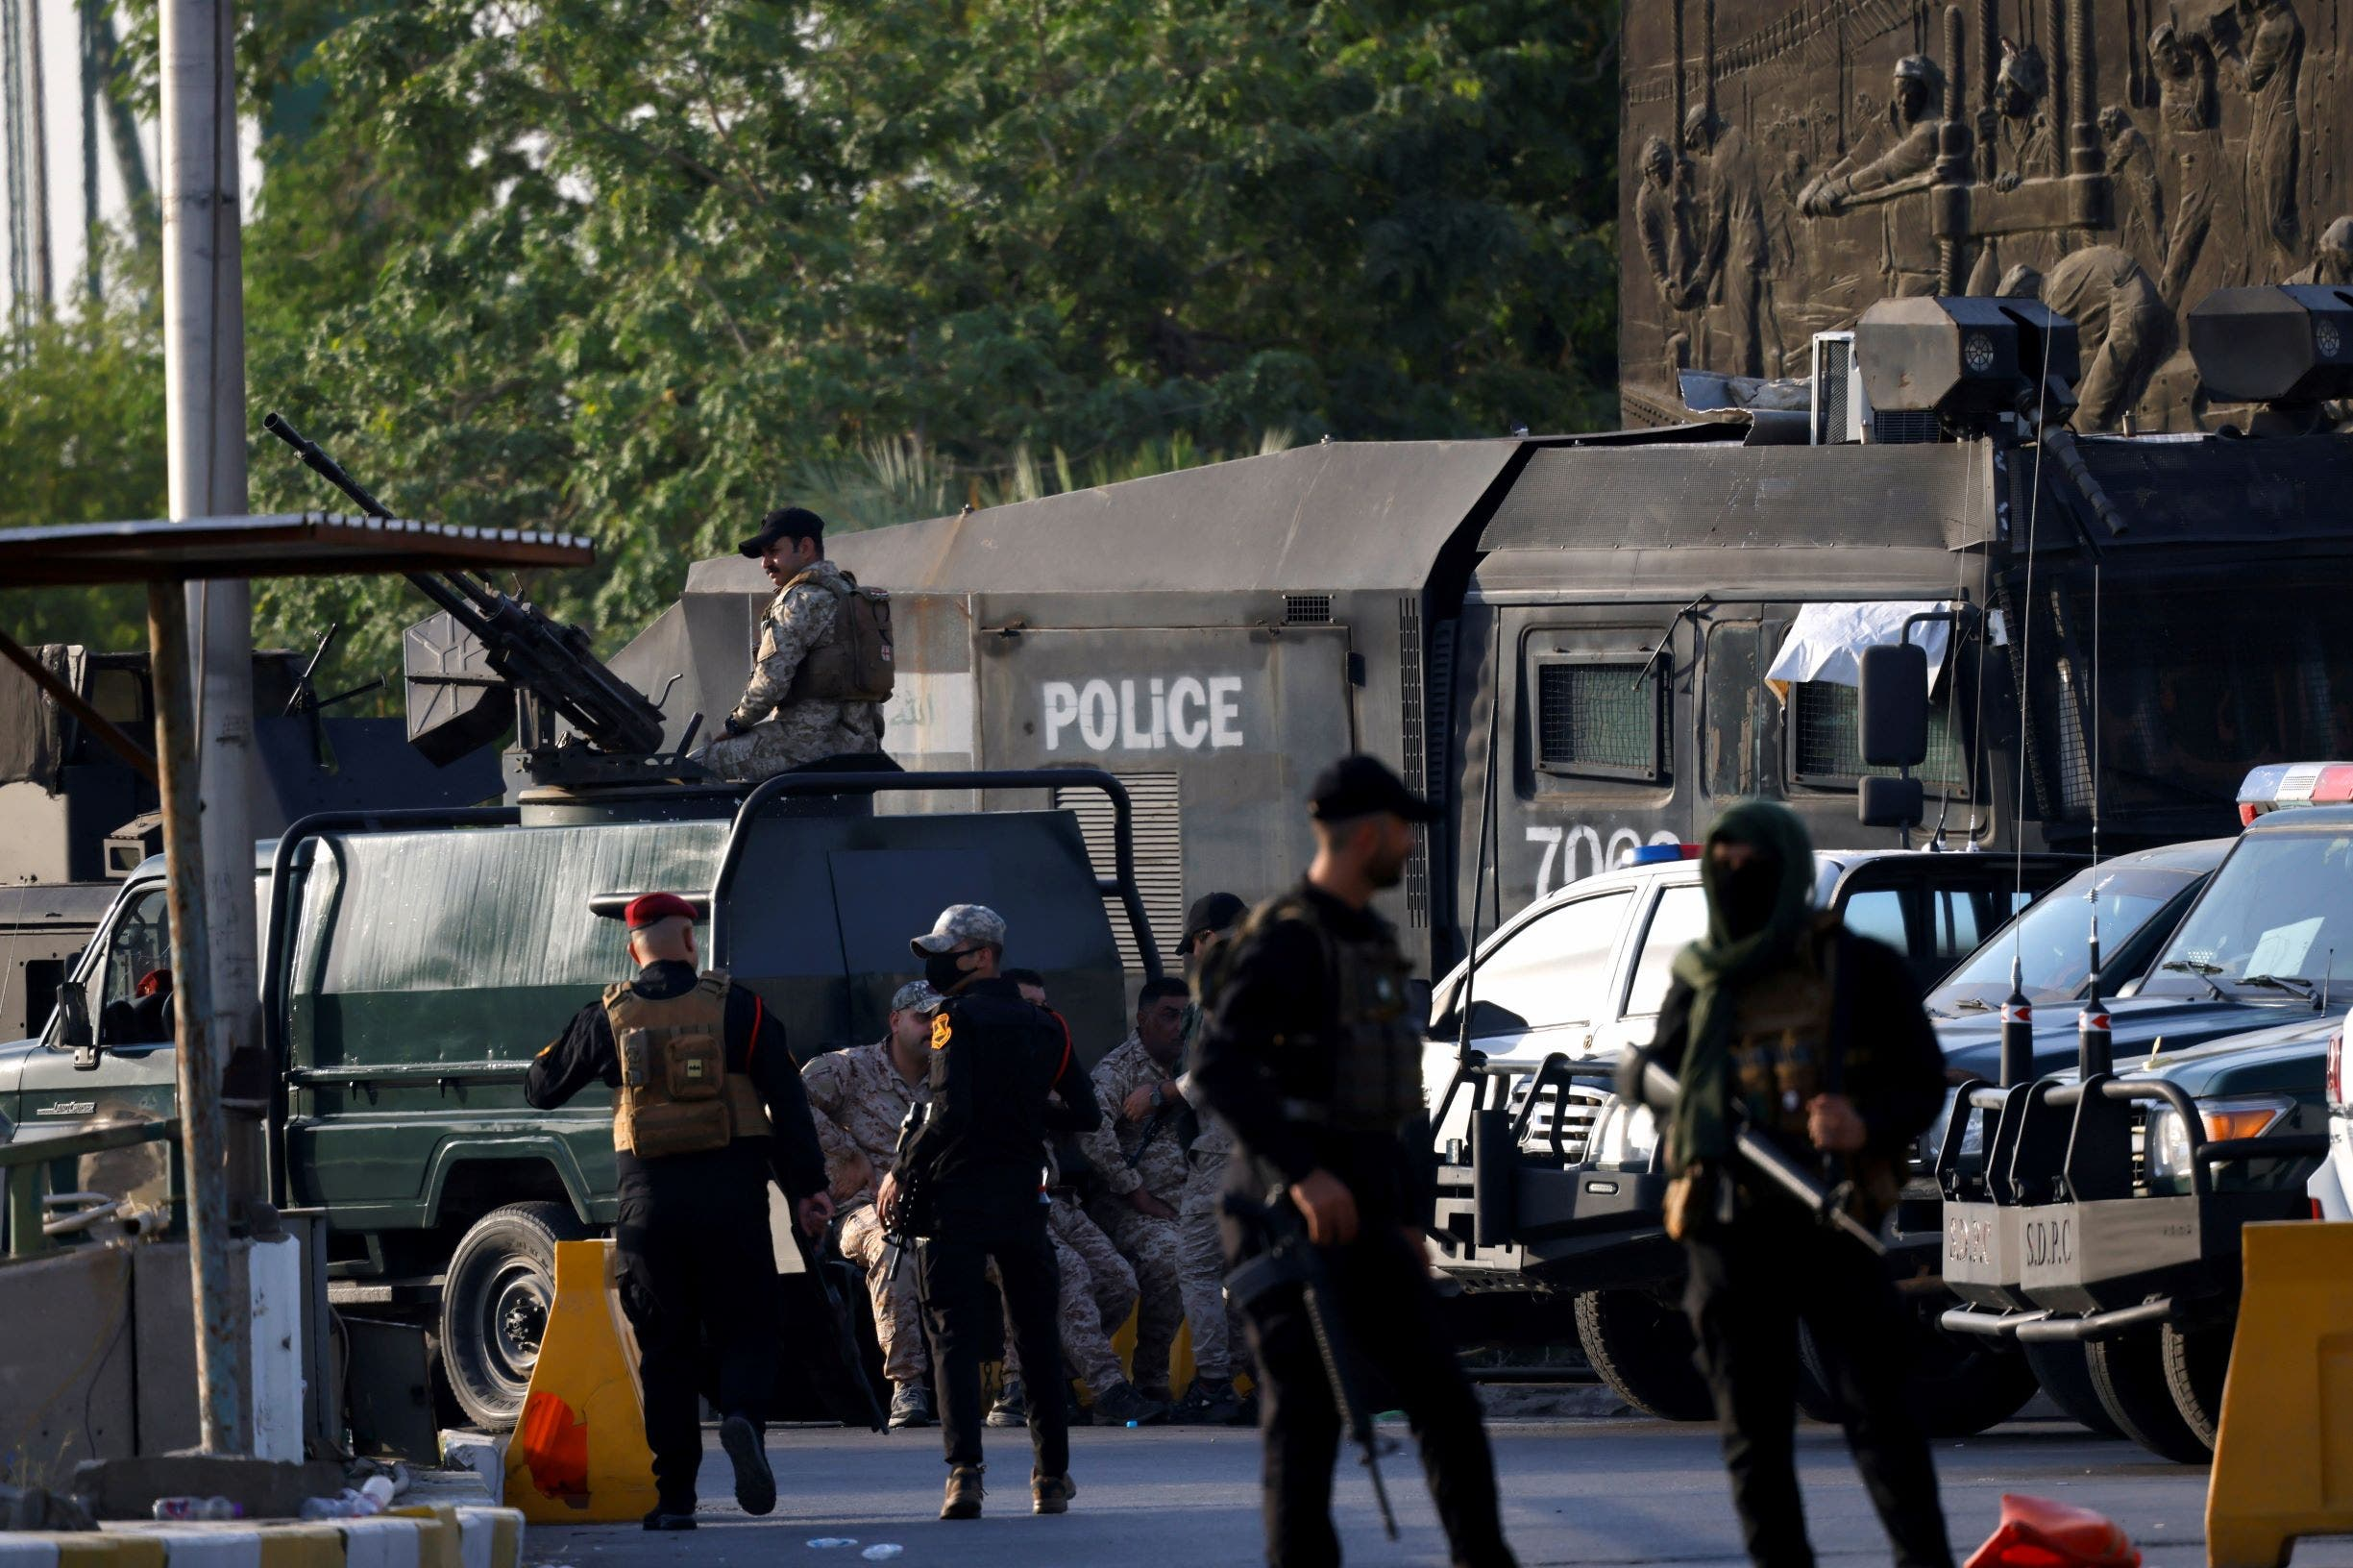 قوات الحشد عند مداخل بغداد